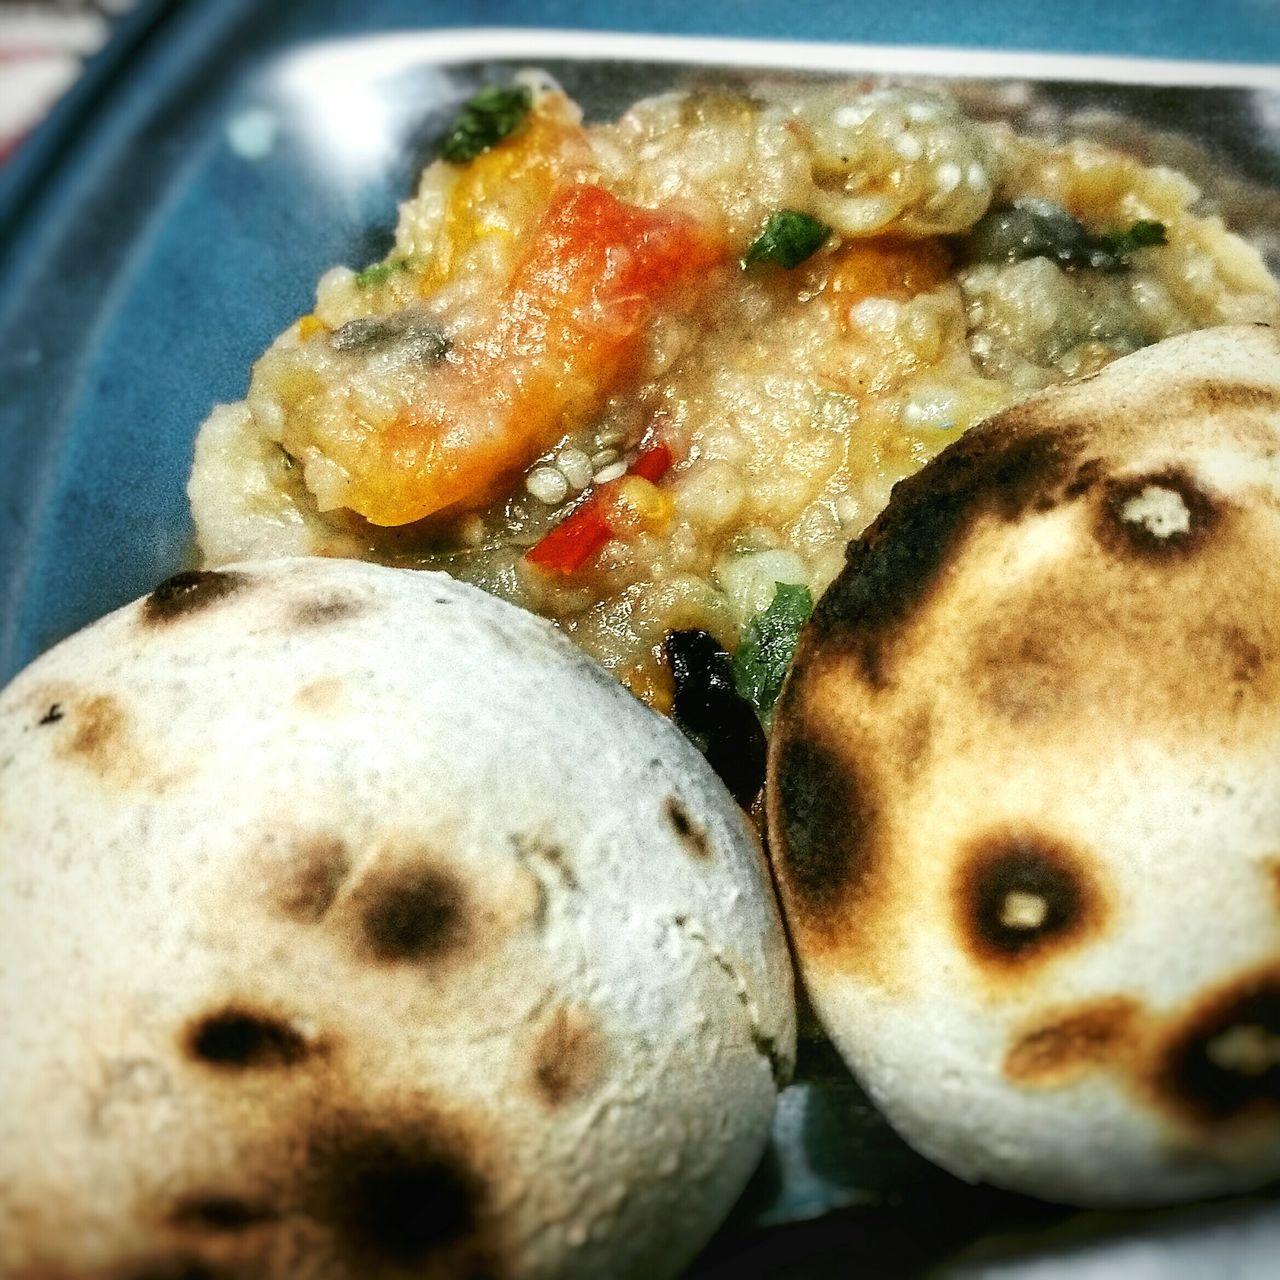 Love for food ,poppular Indian Dish Litti chokha of Bihar Bihar Food Porn LittiChokha ObjectPhotography Desi_diaries Indianfood Mouthwateringfood Appetì